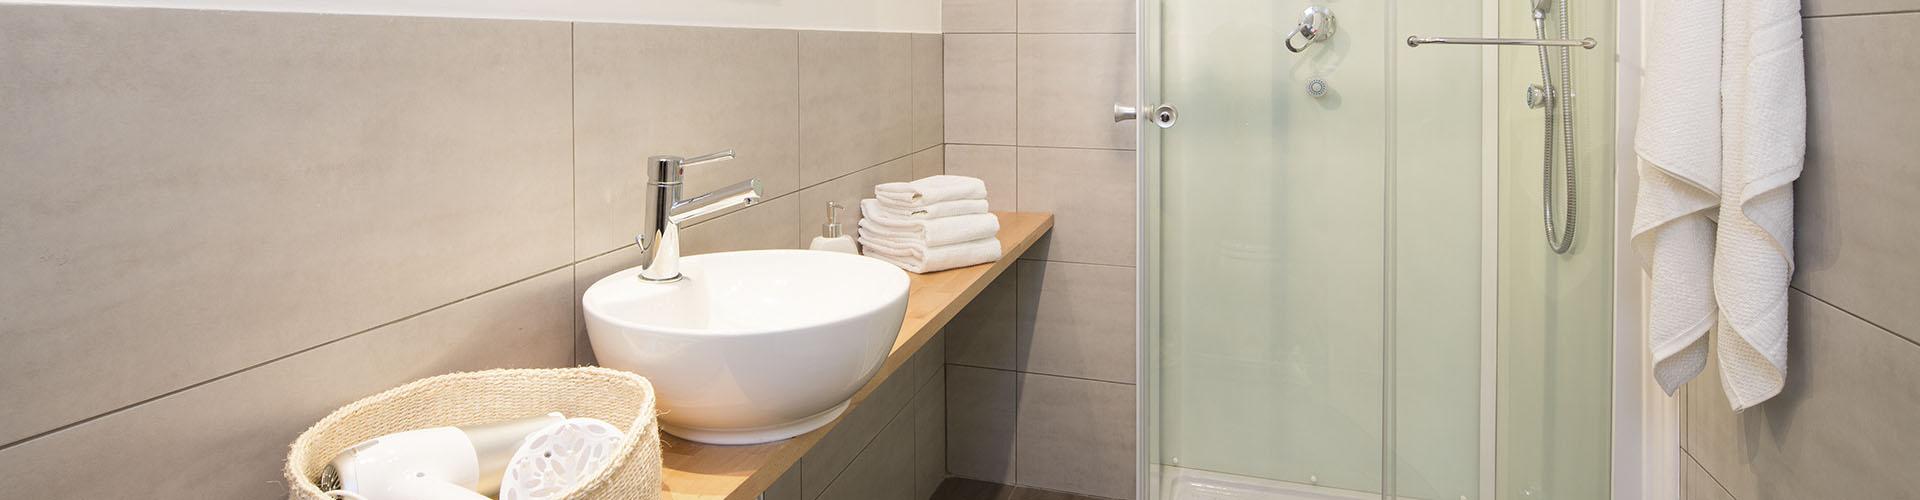 Home Inn Rome - Bathroom